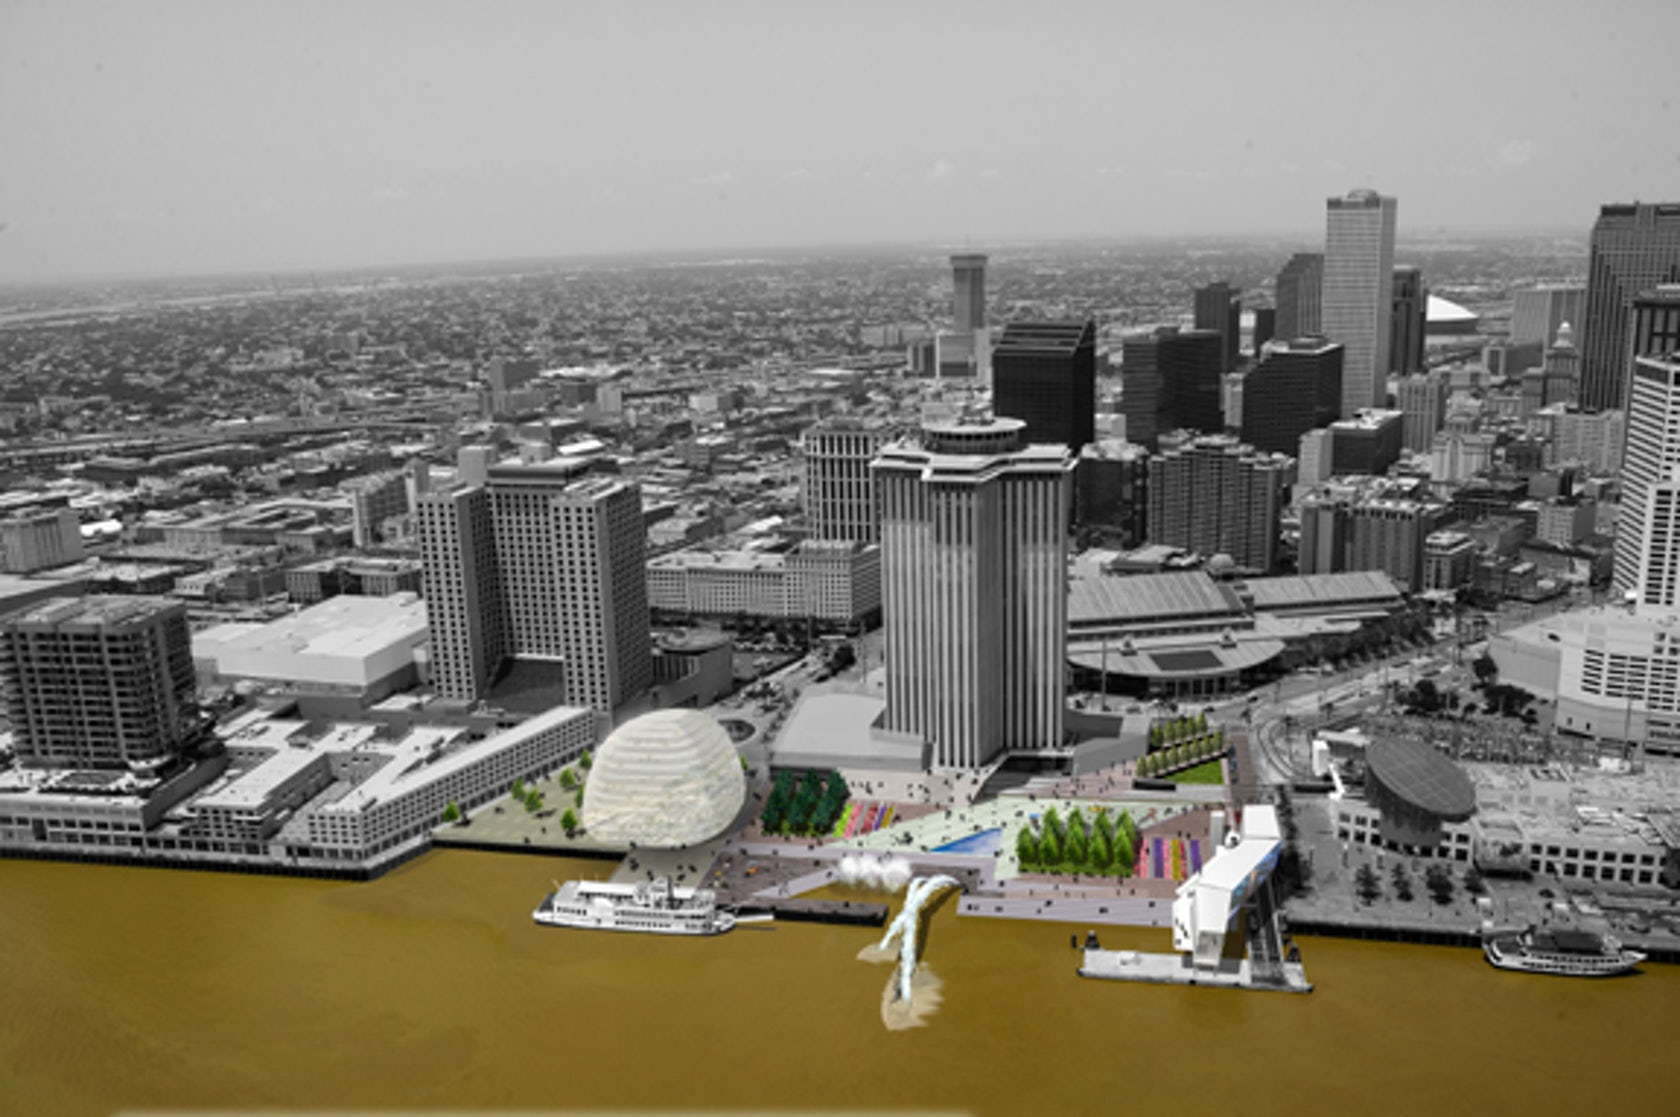 reinventing the crescent new orleans riverfront plan architizer. Black Bedroom Furniture Sets. Home Design Ideas